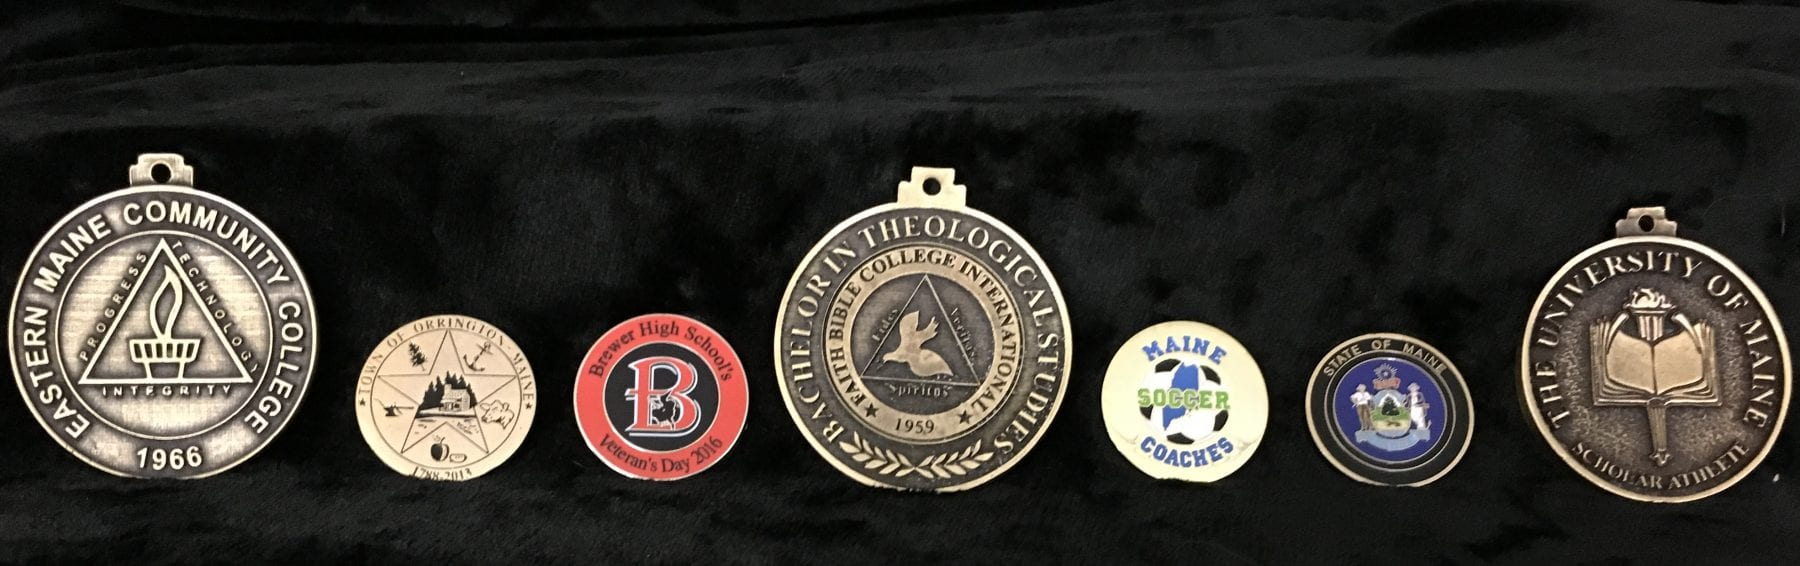 Medallions, Pins & Ribbons - Awards, Signs & Trophies